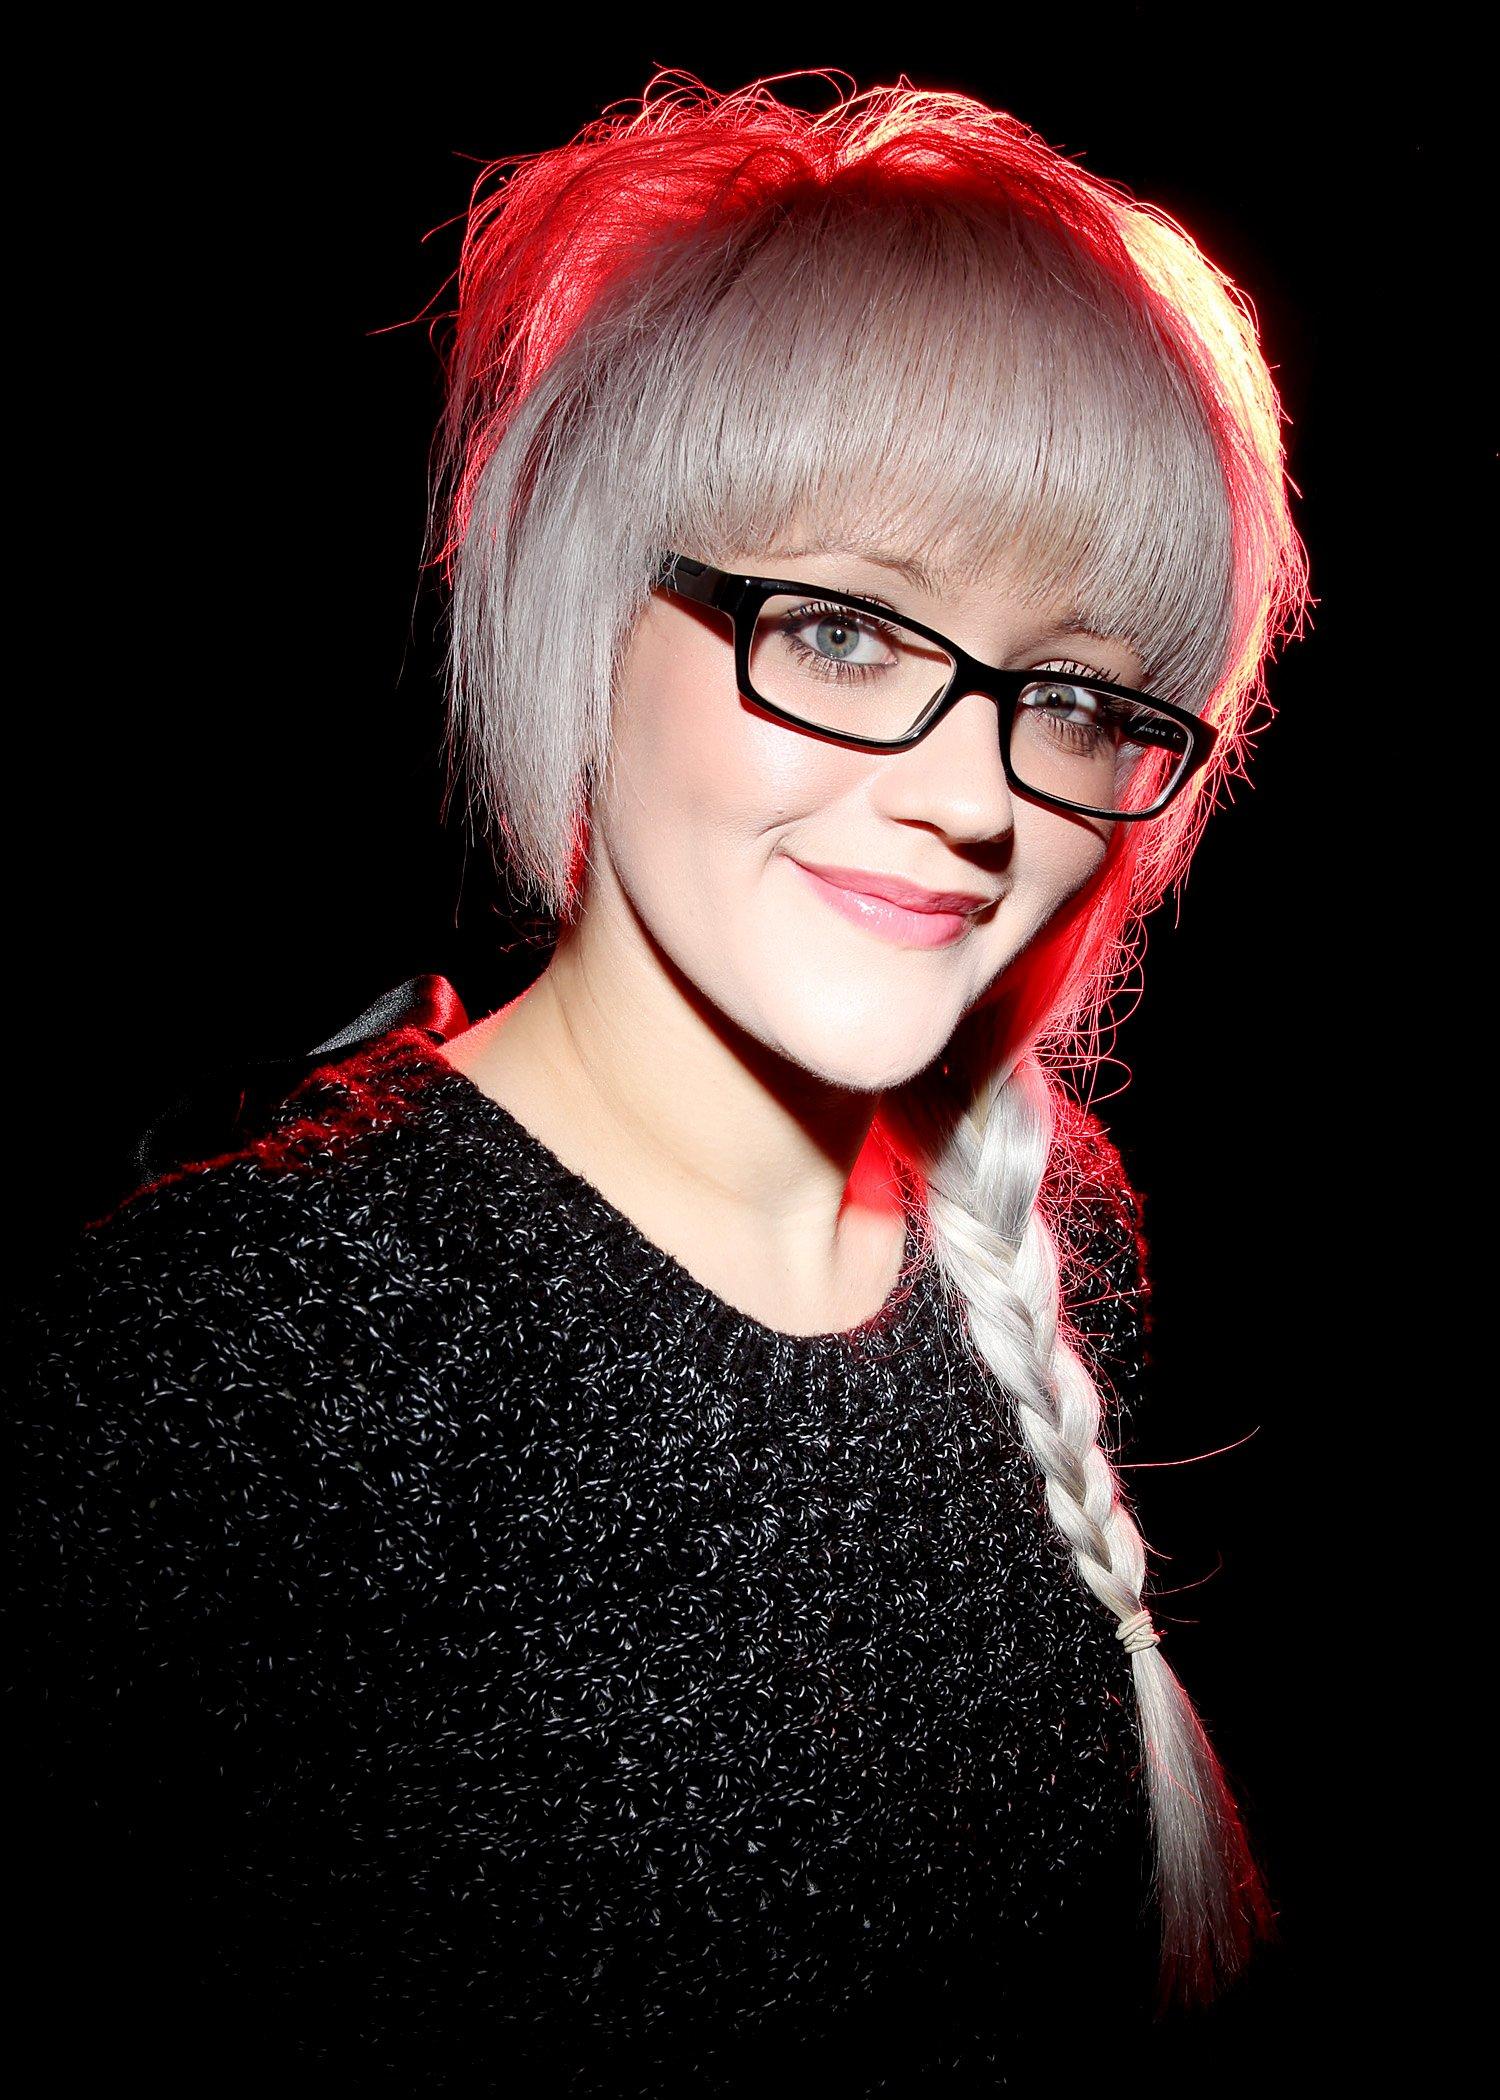 Performer Headshots, Turbo Headshots Service, Laura Pearman Photography, Laura Pearman, Headshots, Stacey Coolidge, Hairdresser, Think Pink Salon